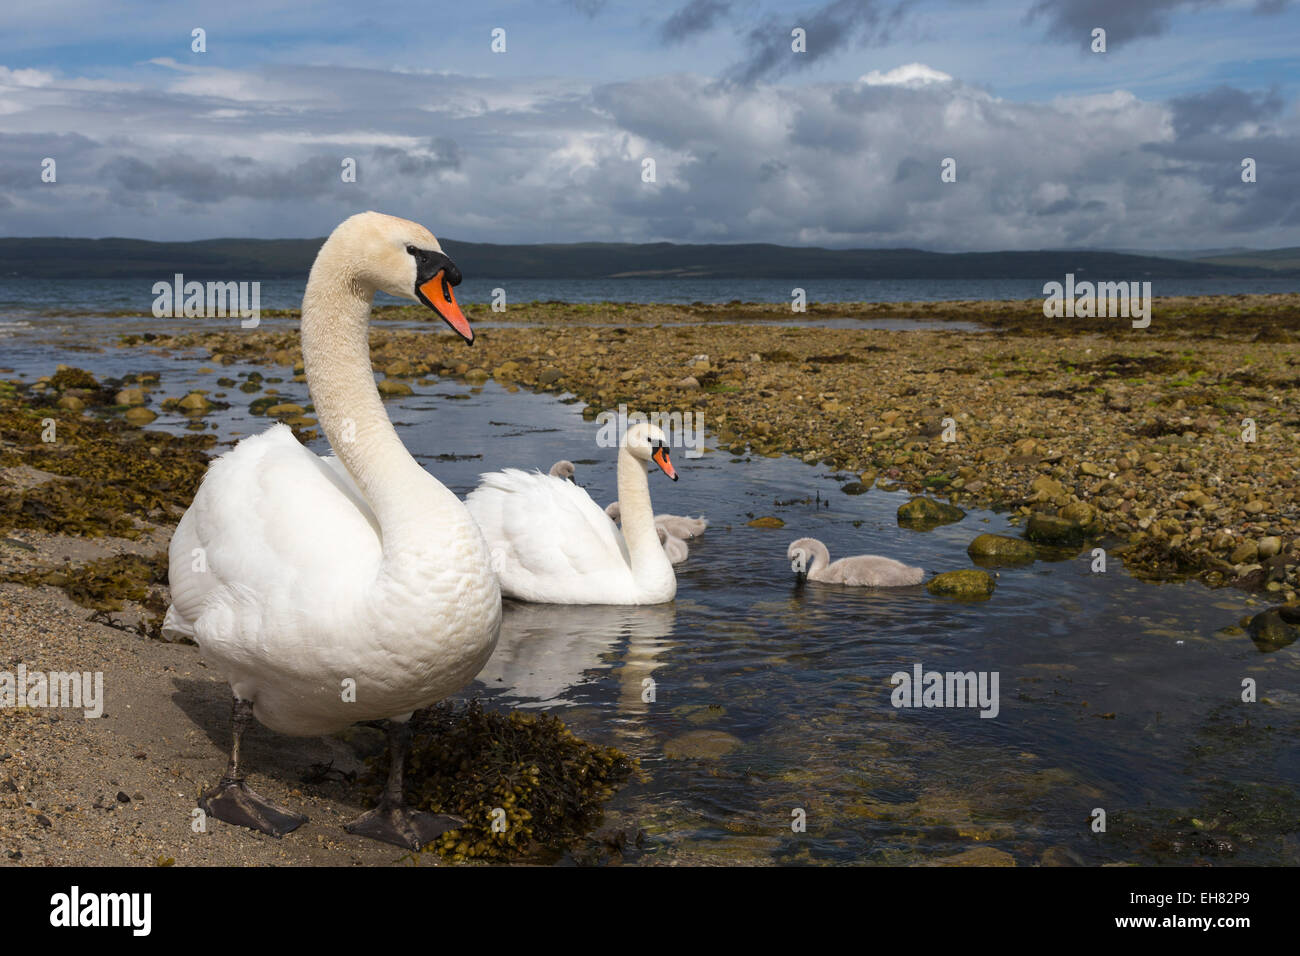 Mute swans (Cygnus olor) on seashore at freshwater stream mouth, Arran, Scotland, United Kingdom, Europe - Stock Image